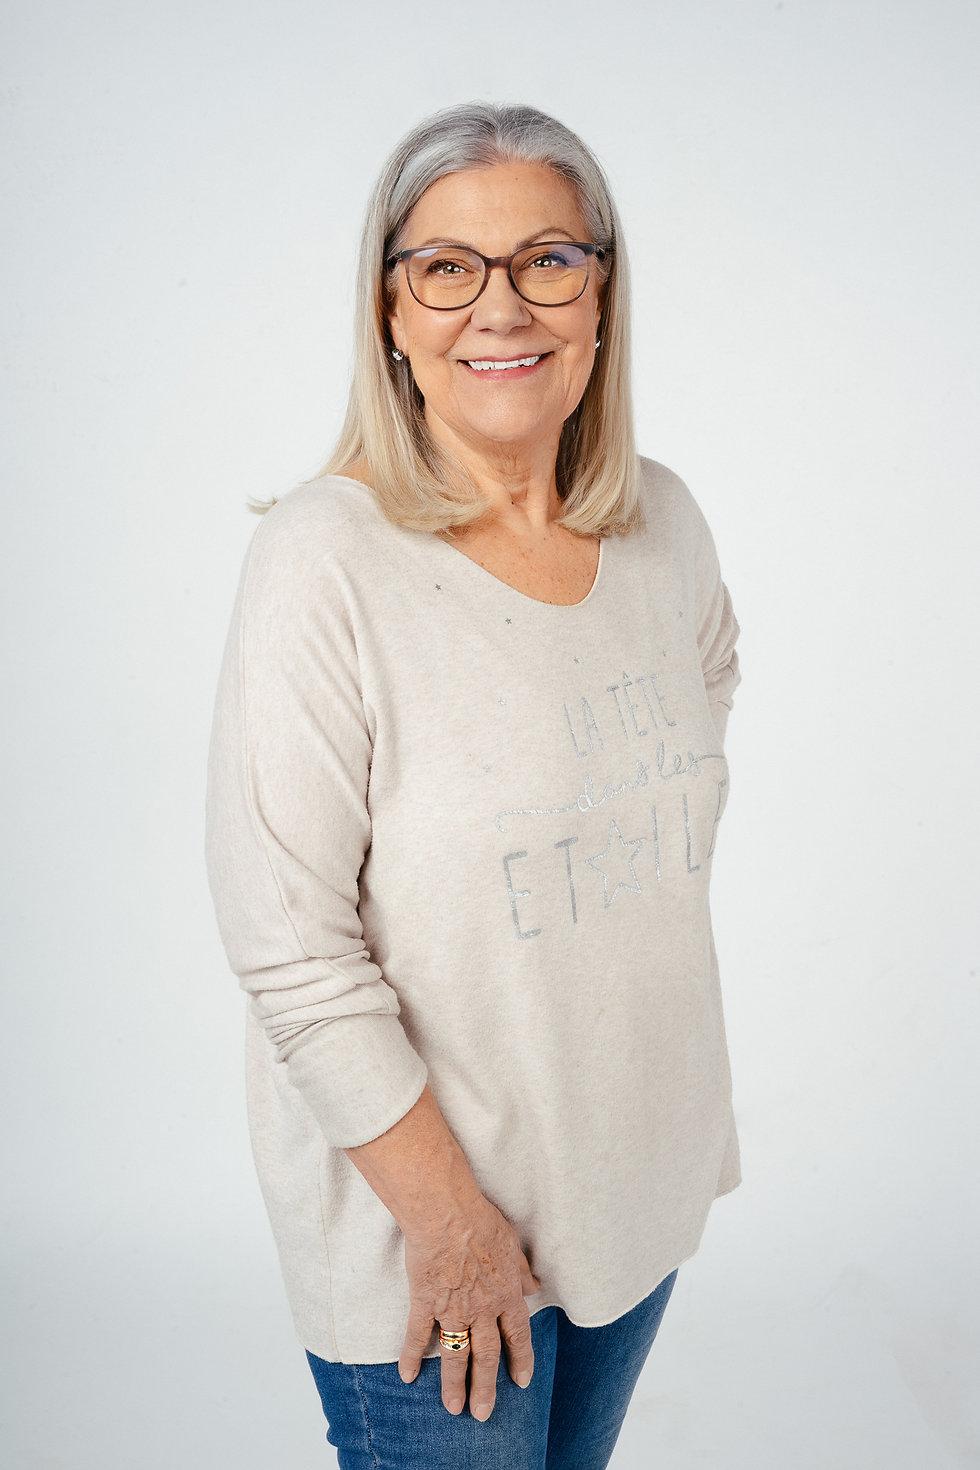 Christine Pfanzelt Business Portrait